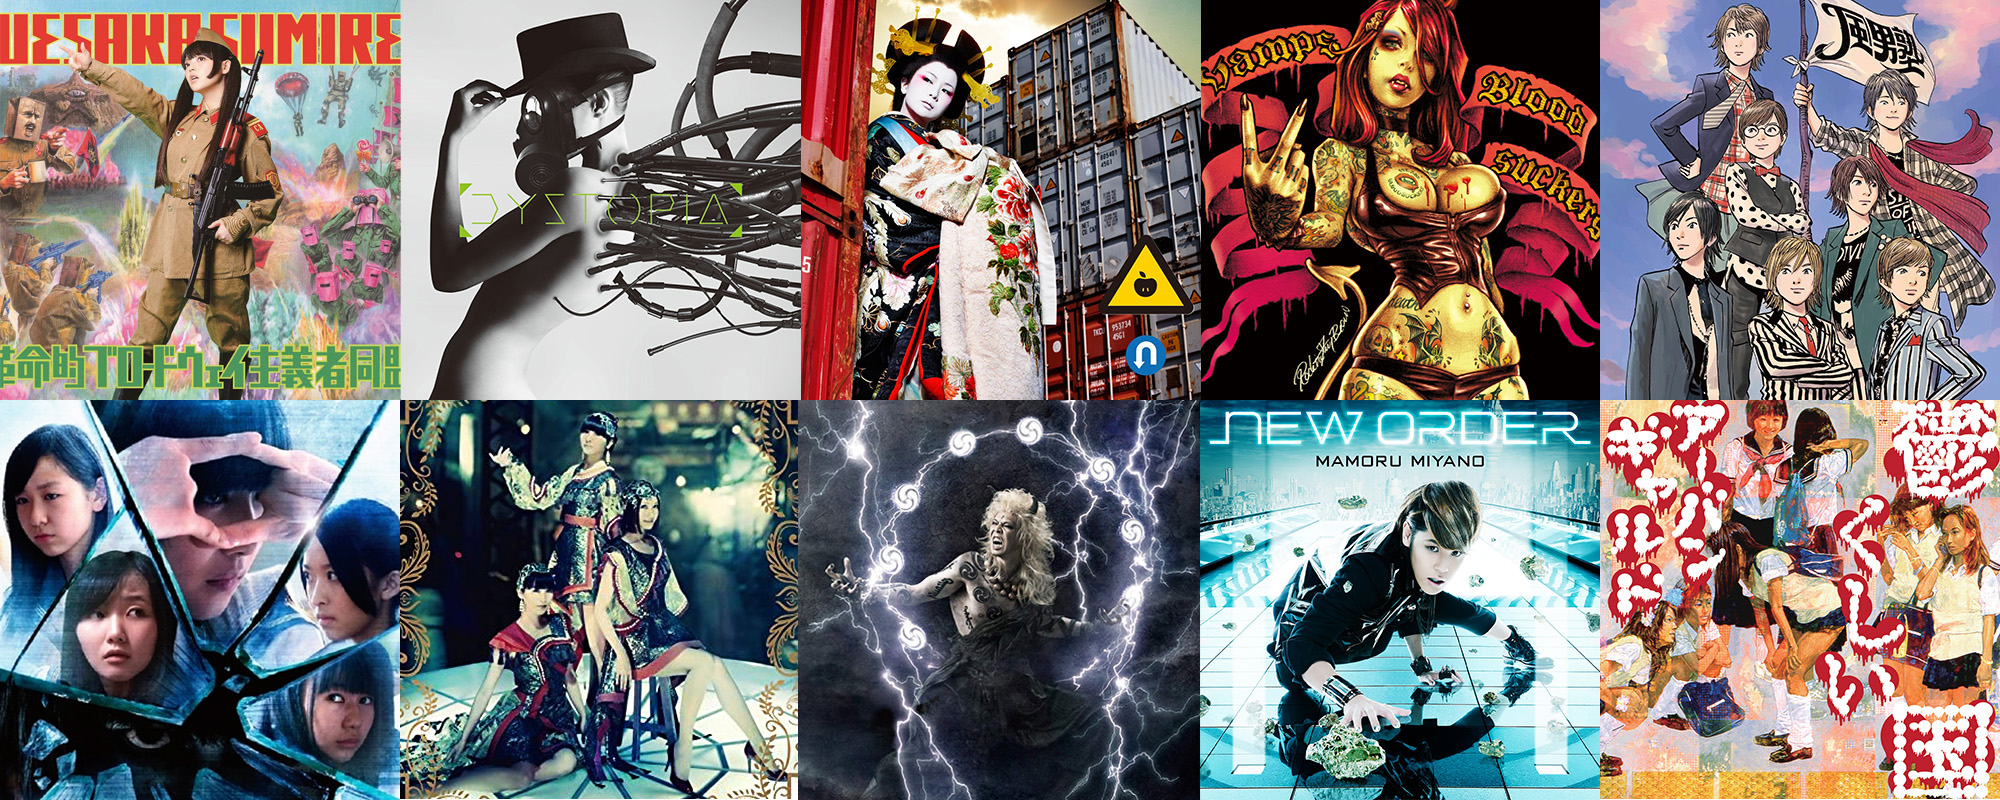 Best J-Pop J-Rock album covers 2014